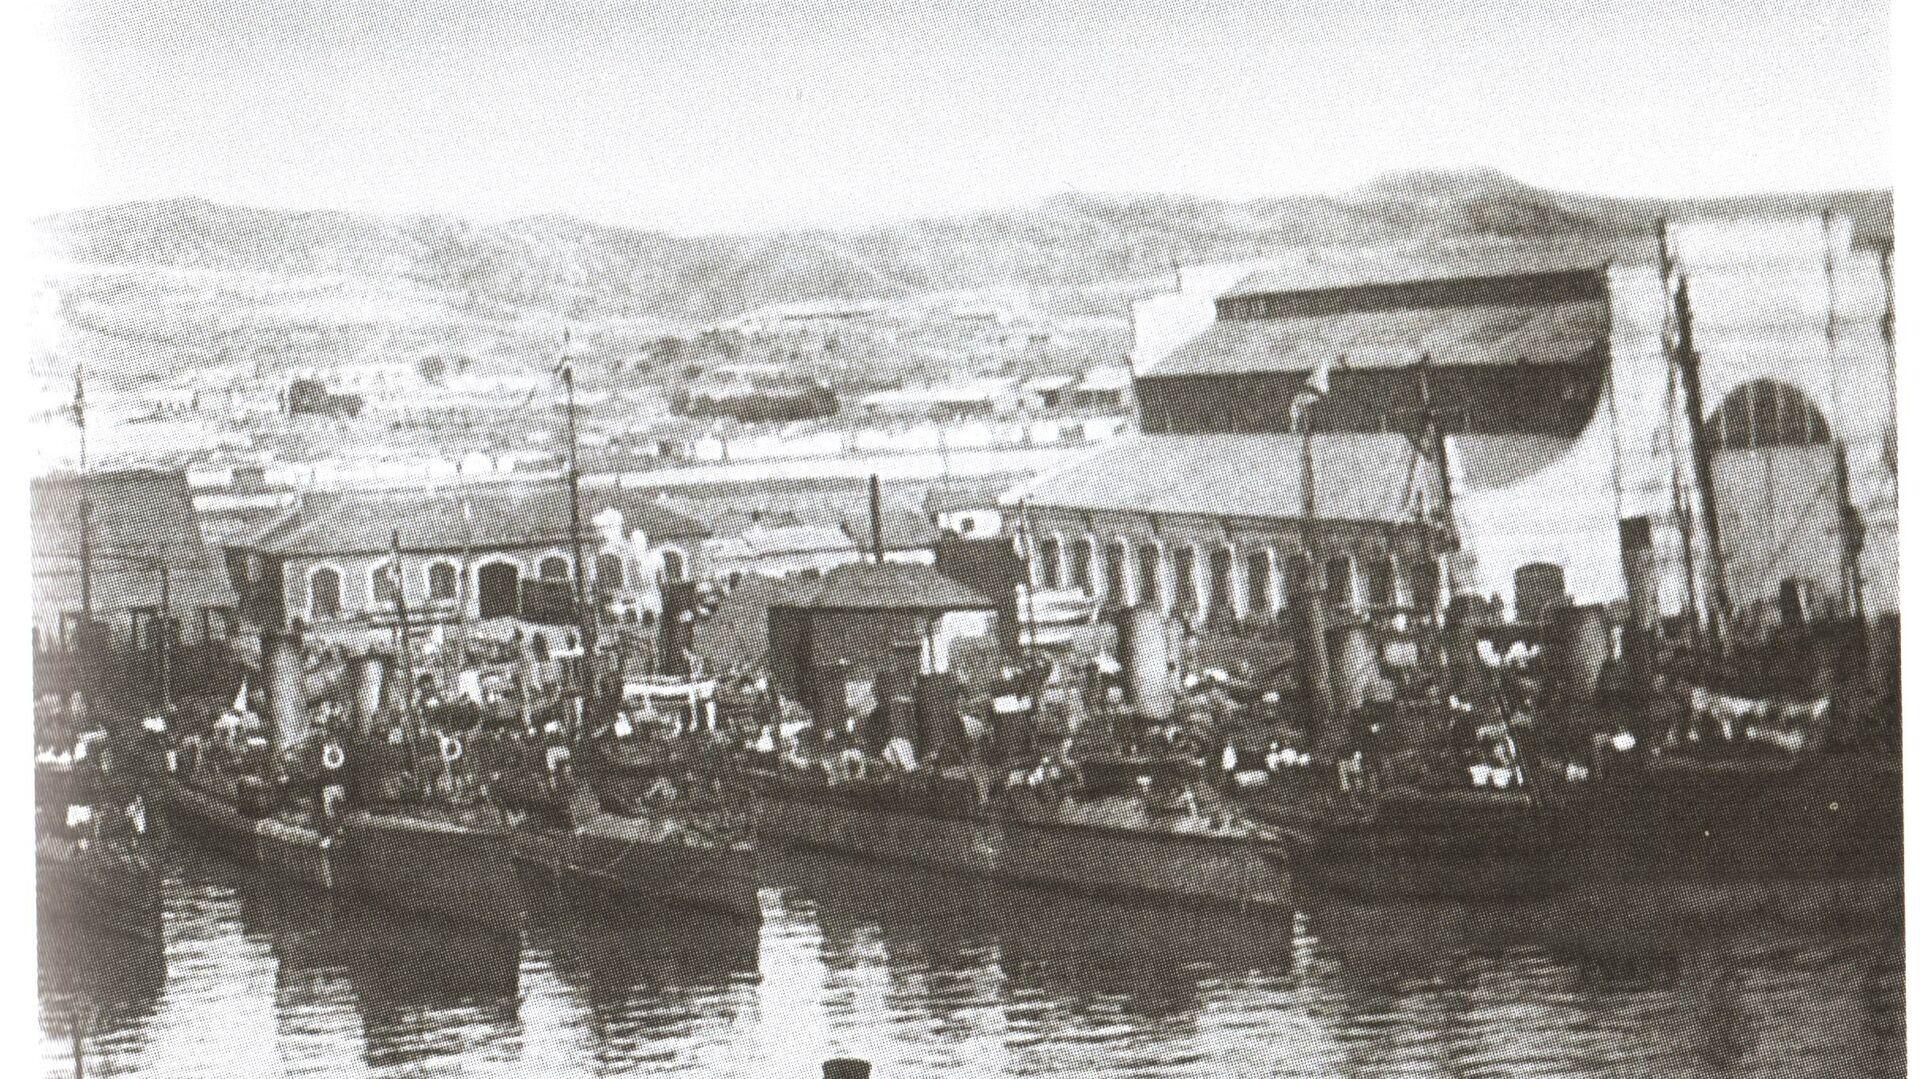 Русские миноносцы в гавани Порт-Артура. 1904 год  - РИА Новости, 1920, 22.10.2020